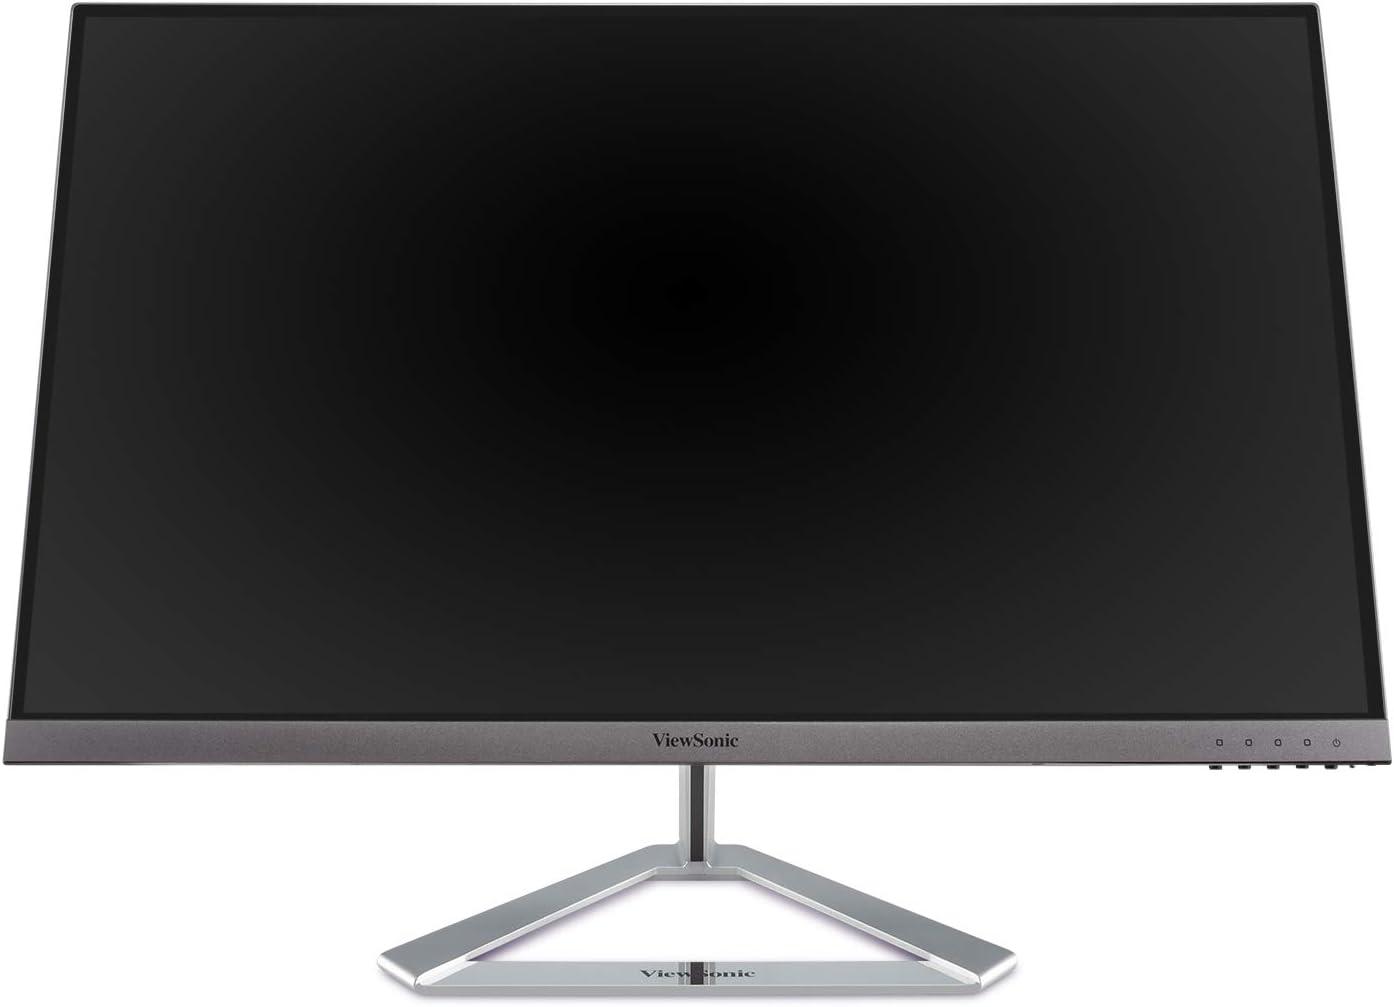 ViewSonic VX3276-2K-MHD 32 Inch Frameless Widescreen IPS 1440p Monitor with HDMI DisplayPort and Mini DisplayPort